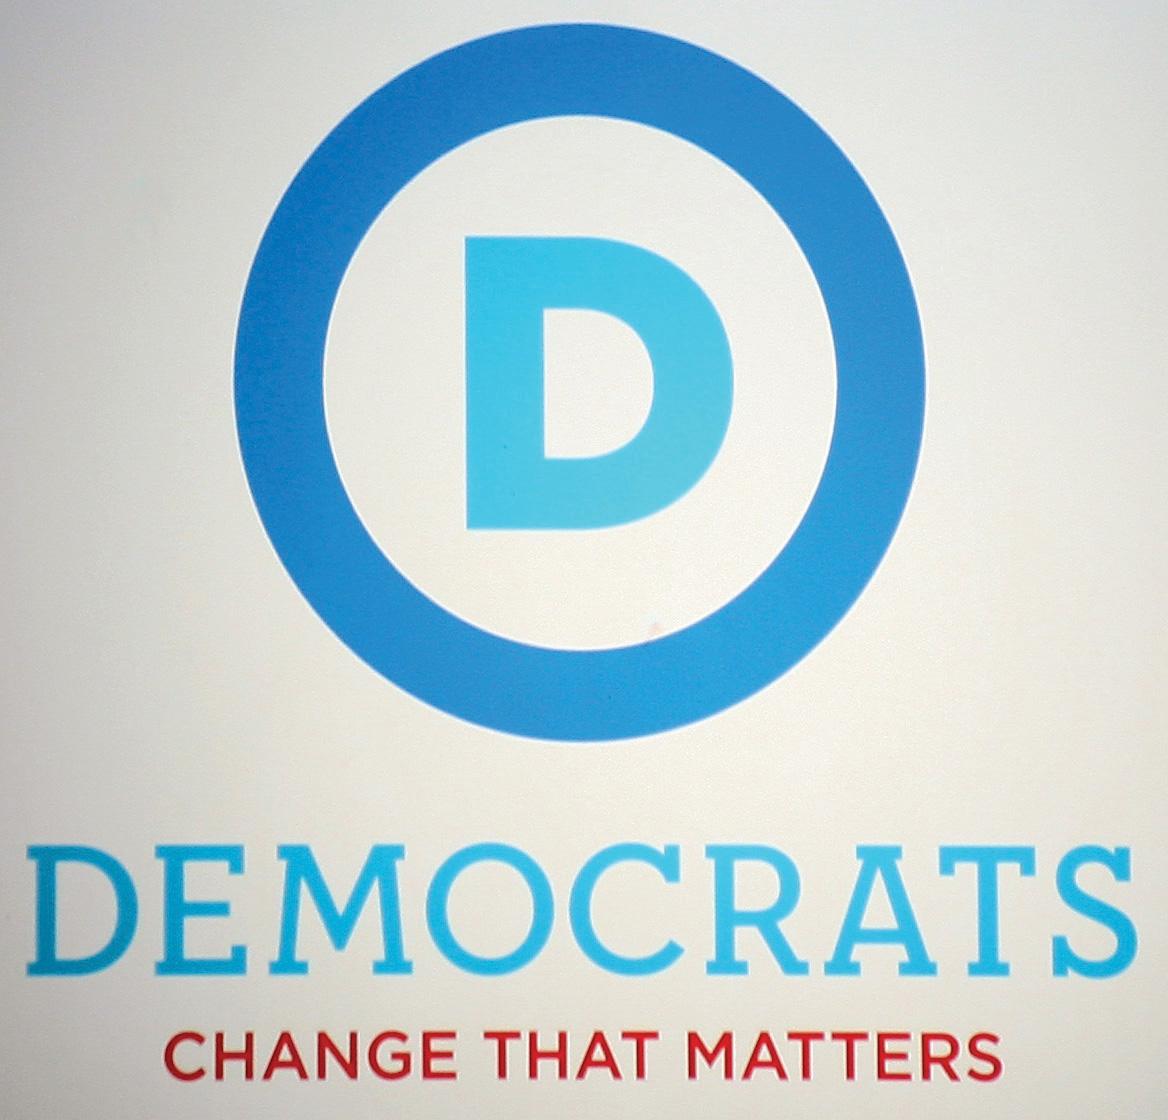 The democrat logo: